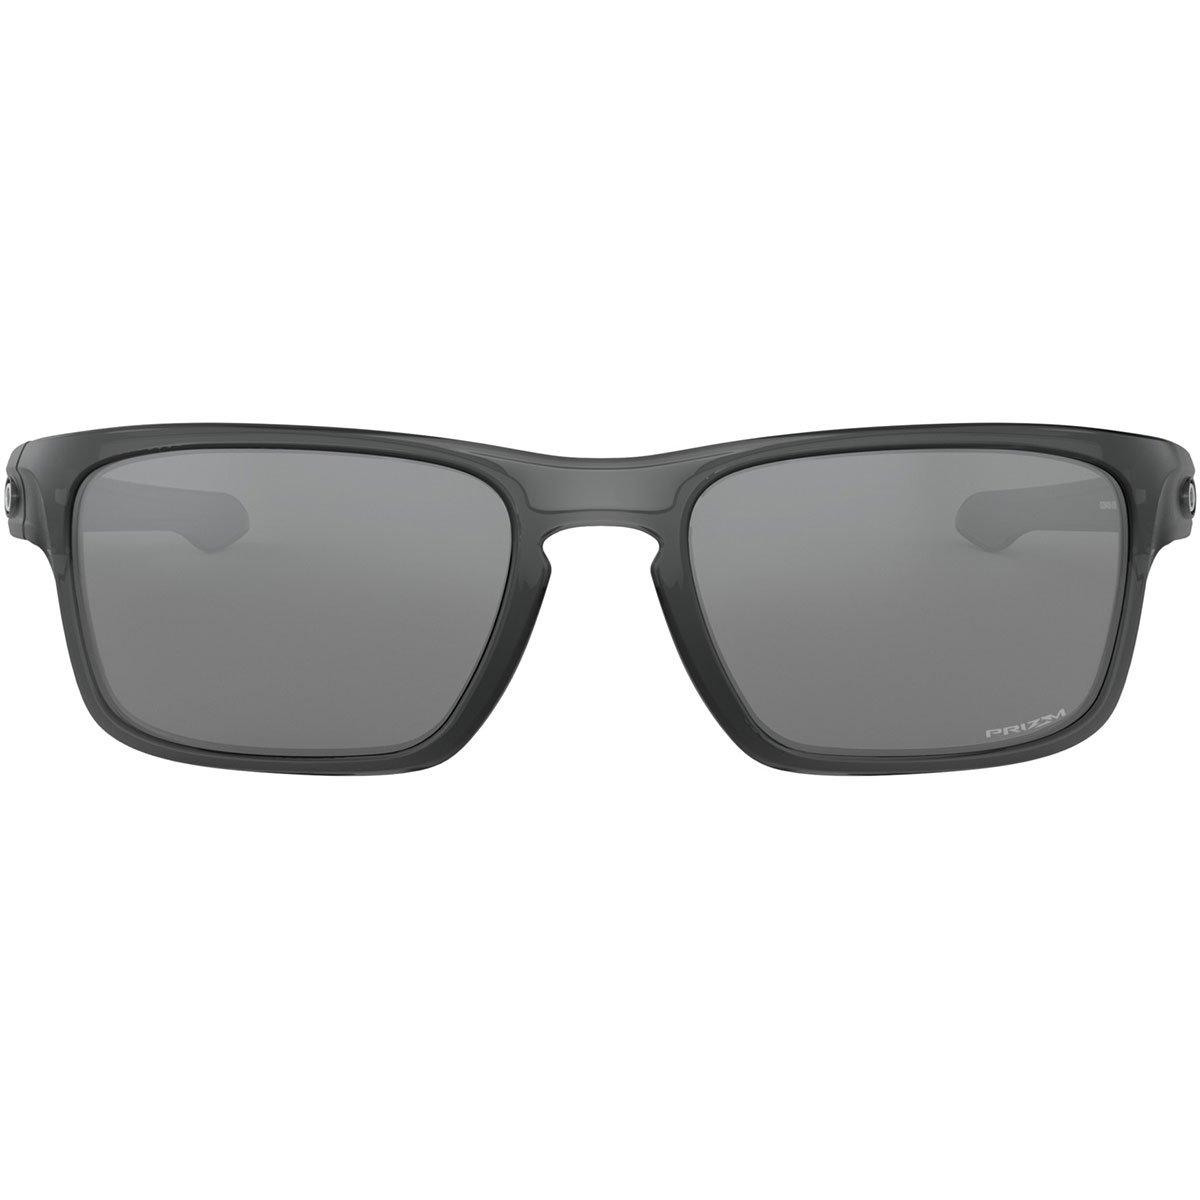 b90bf67f5dccd Amazon.com  Oakley Men s Sliver Stealth Non-Polarized Iridium Rectangular  Sunglasses GREY SMOKE 55.8 mm  Clothing